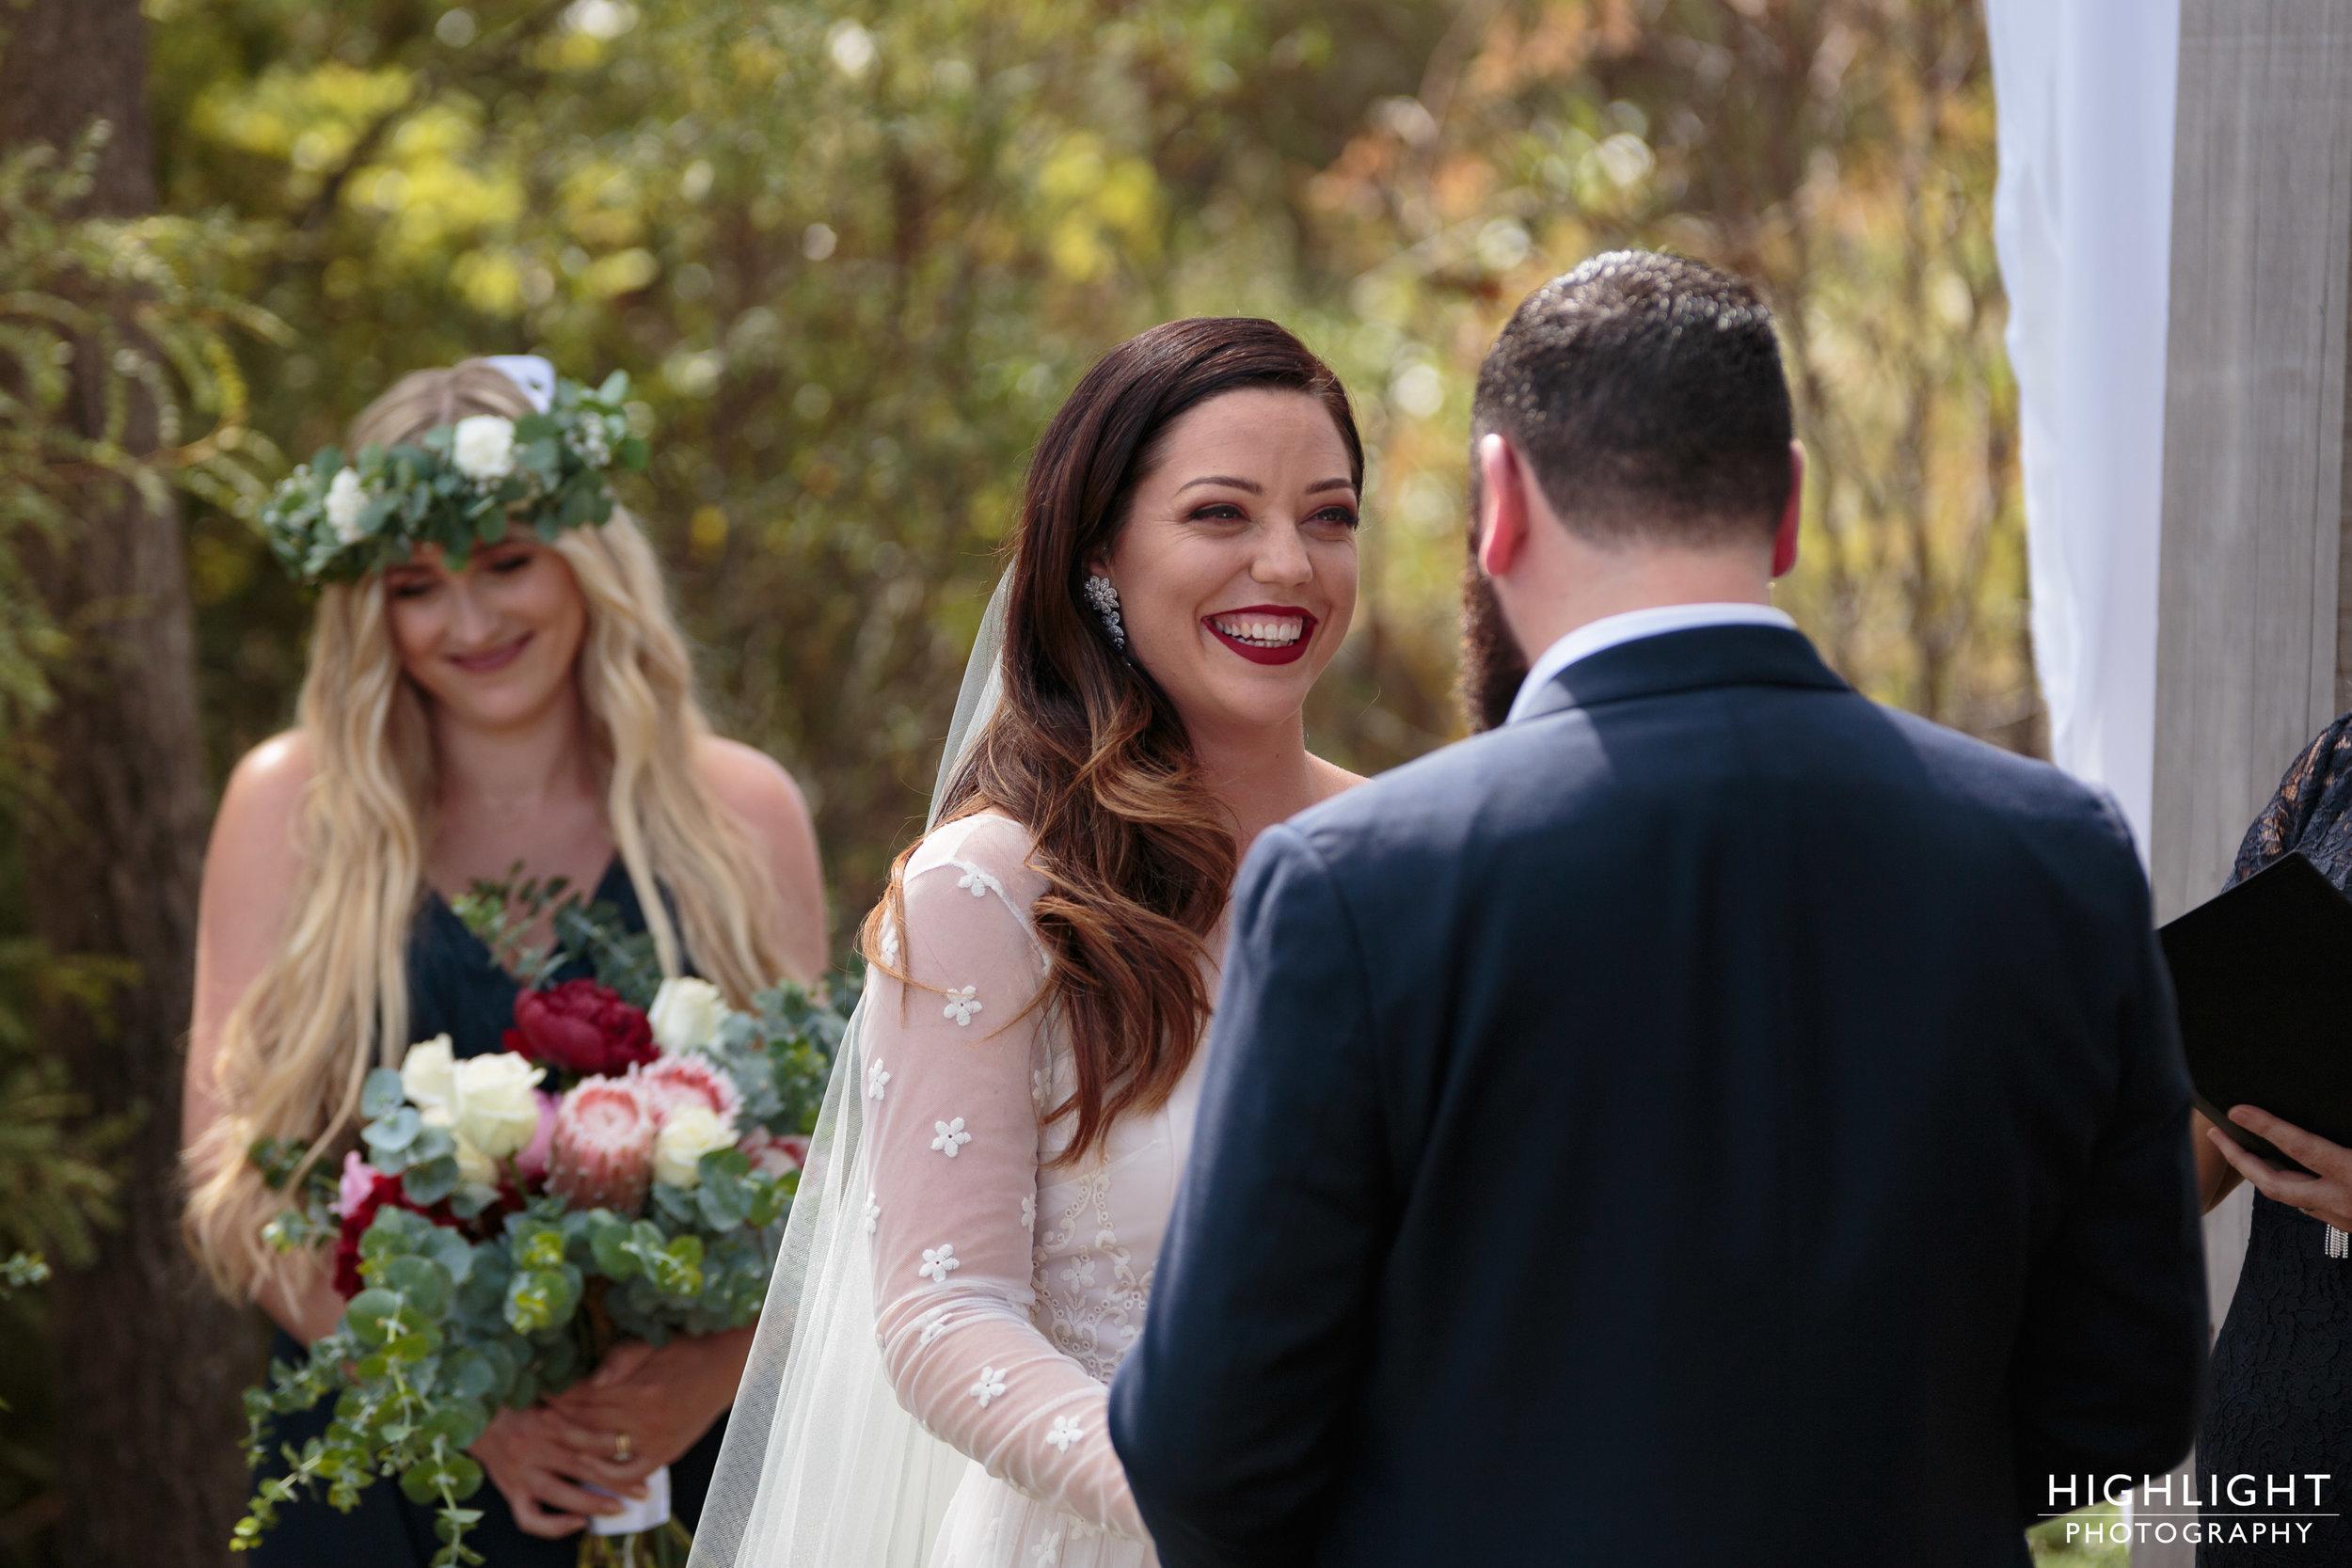 highlight-wedding-photography-new-zealand-makoura-lodge-wedding-73.jpg